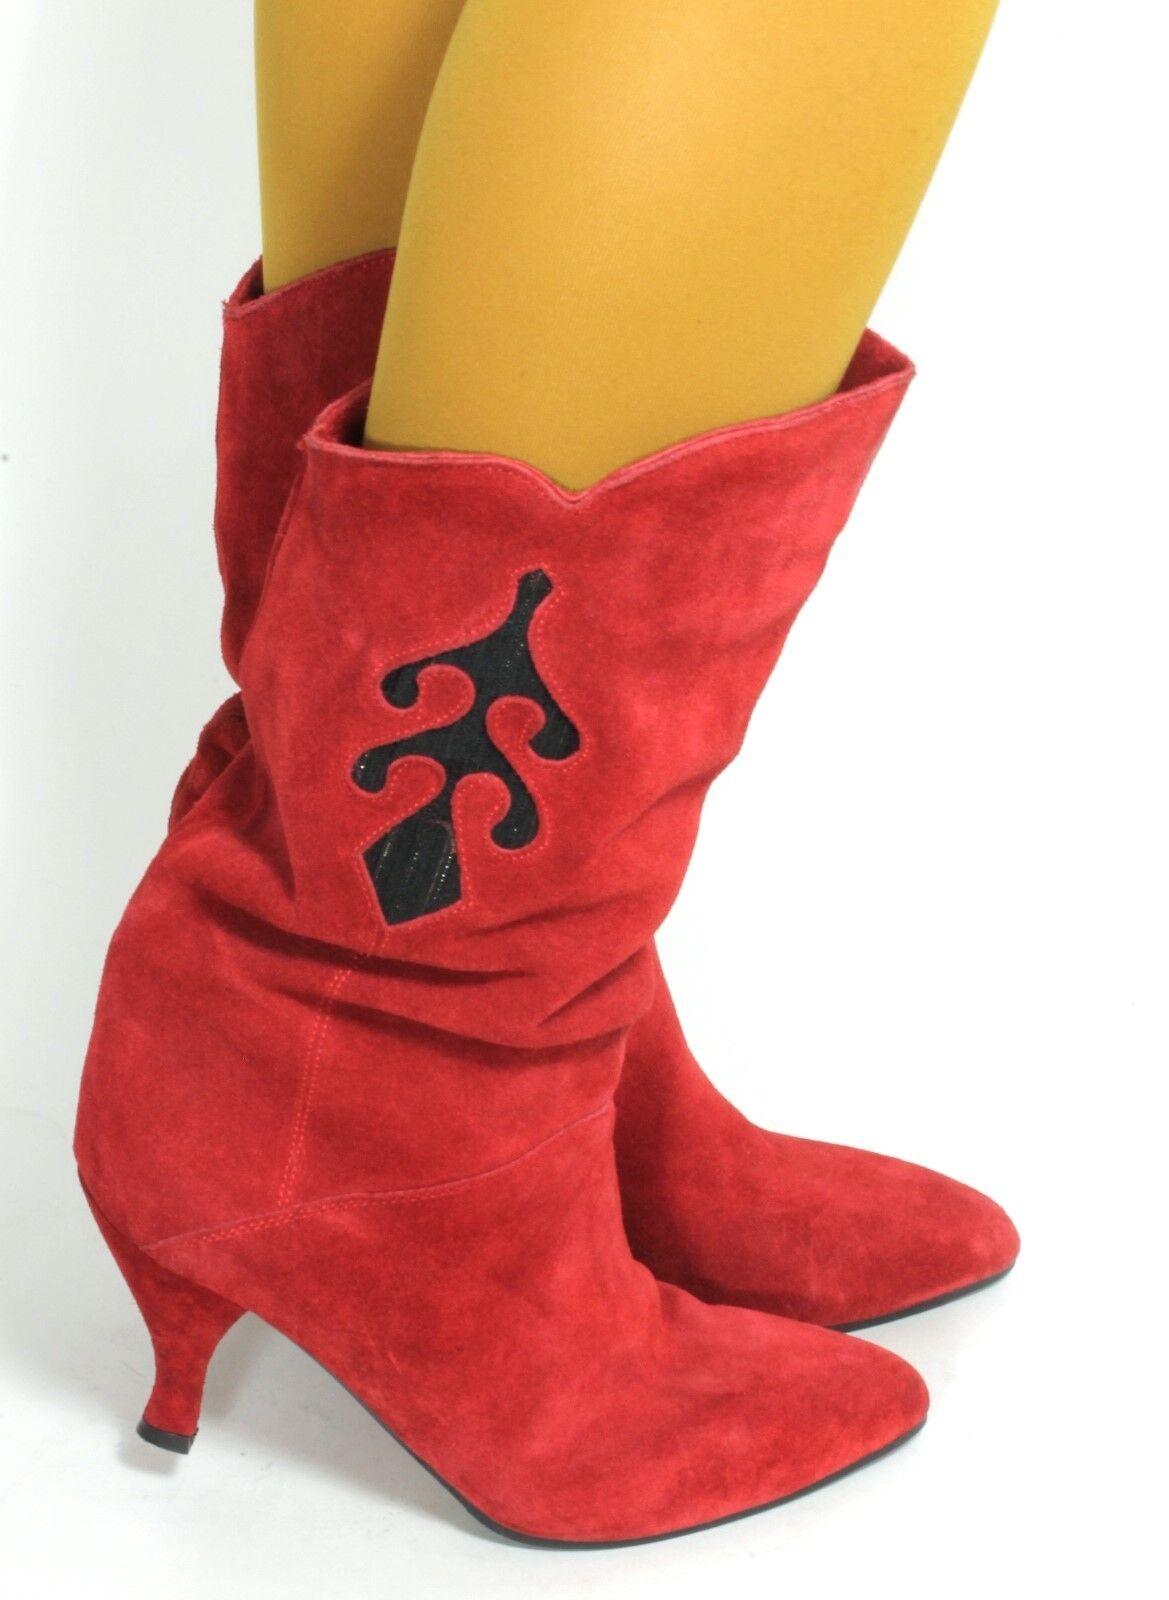 Bottes Femmes Vintage Bottes bottes cuir talons hauts  Rouge or  41